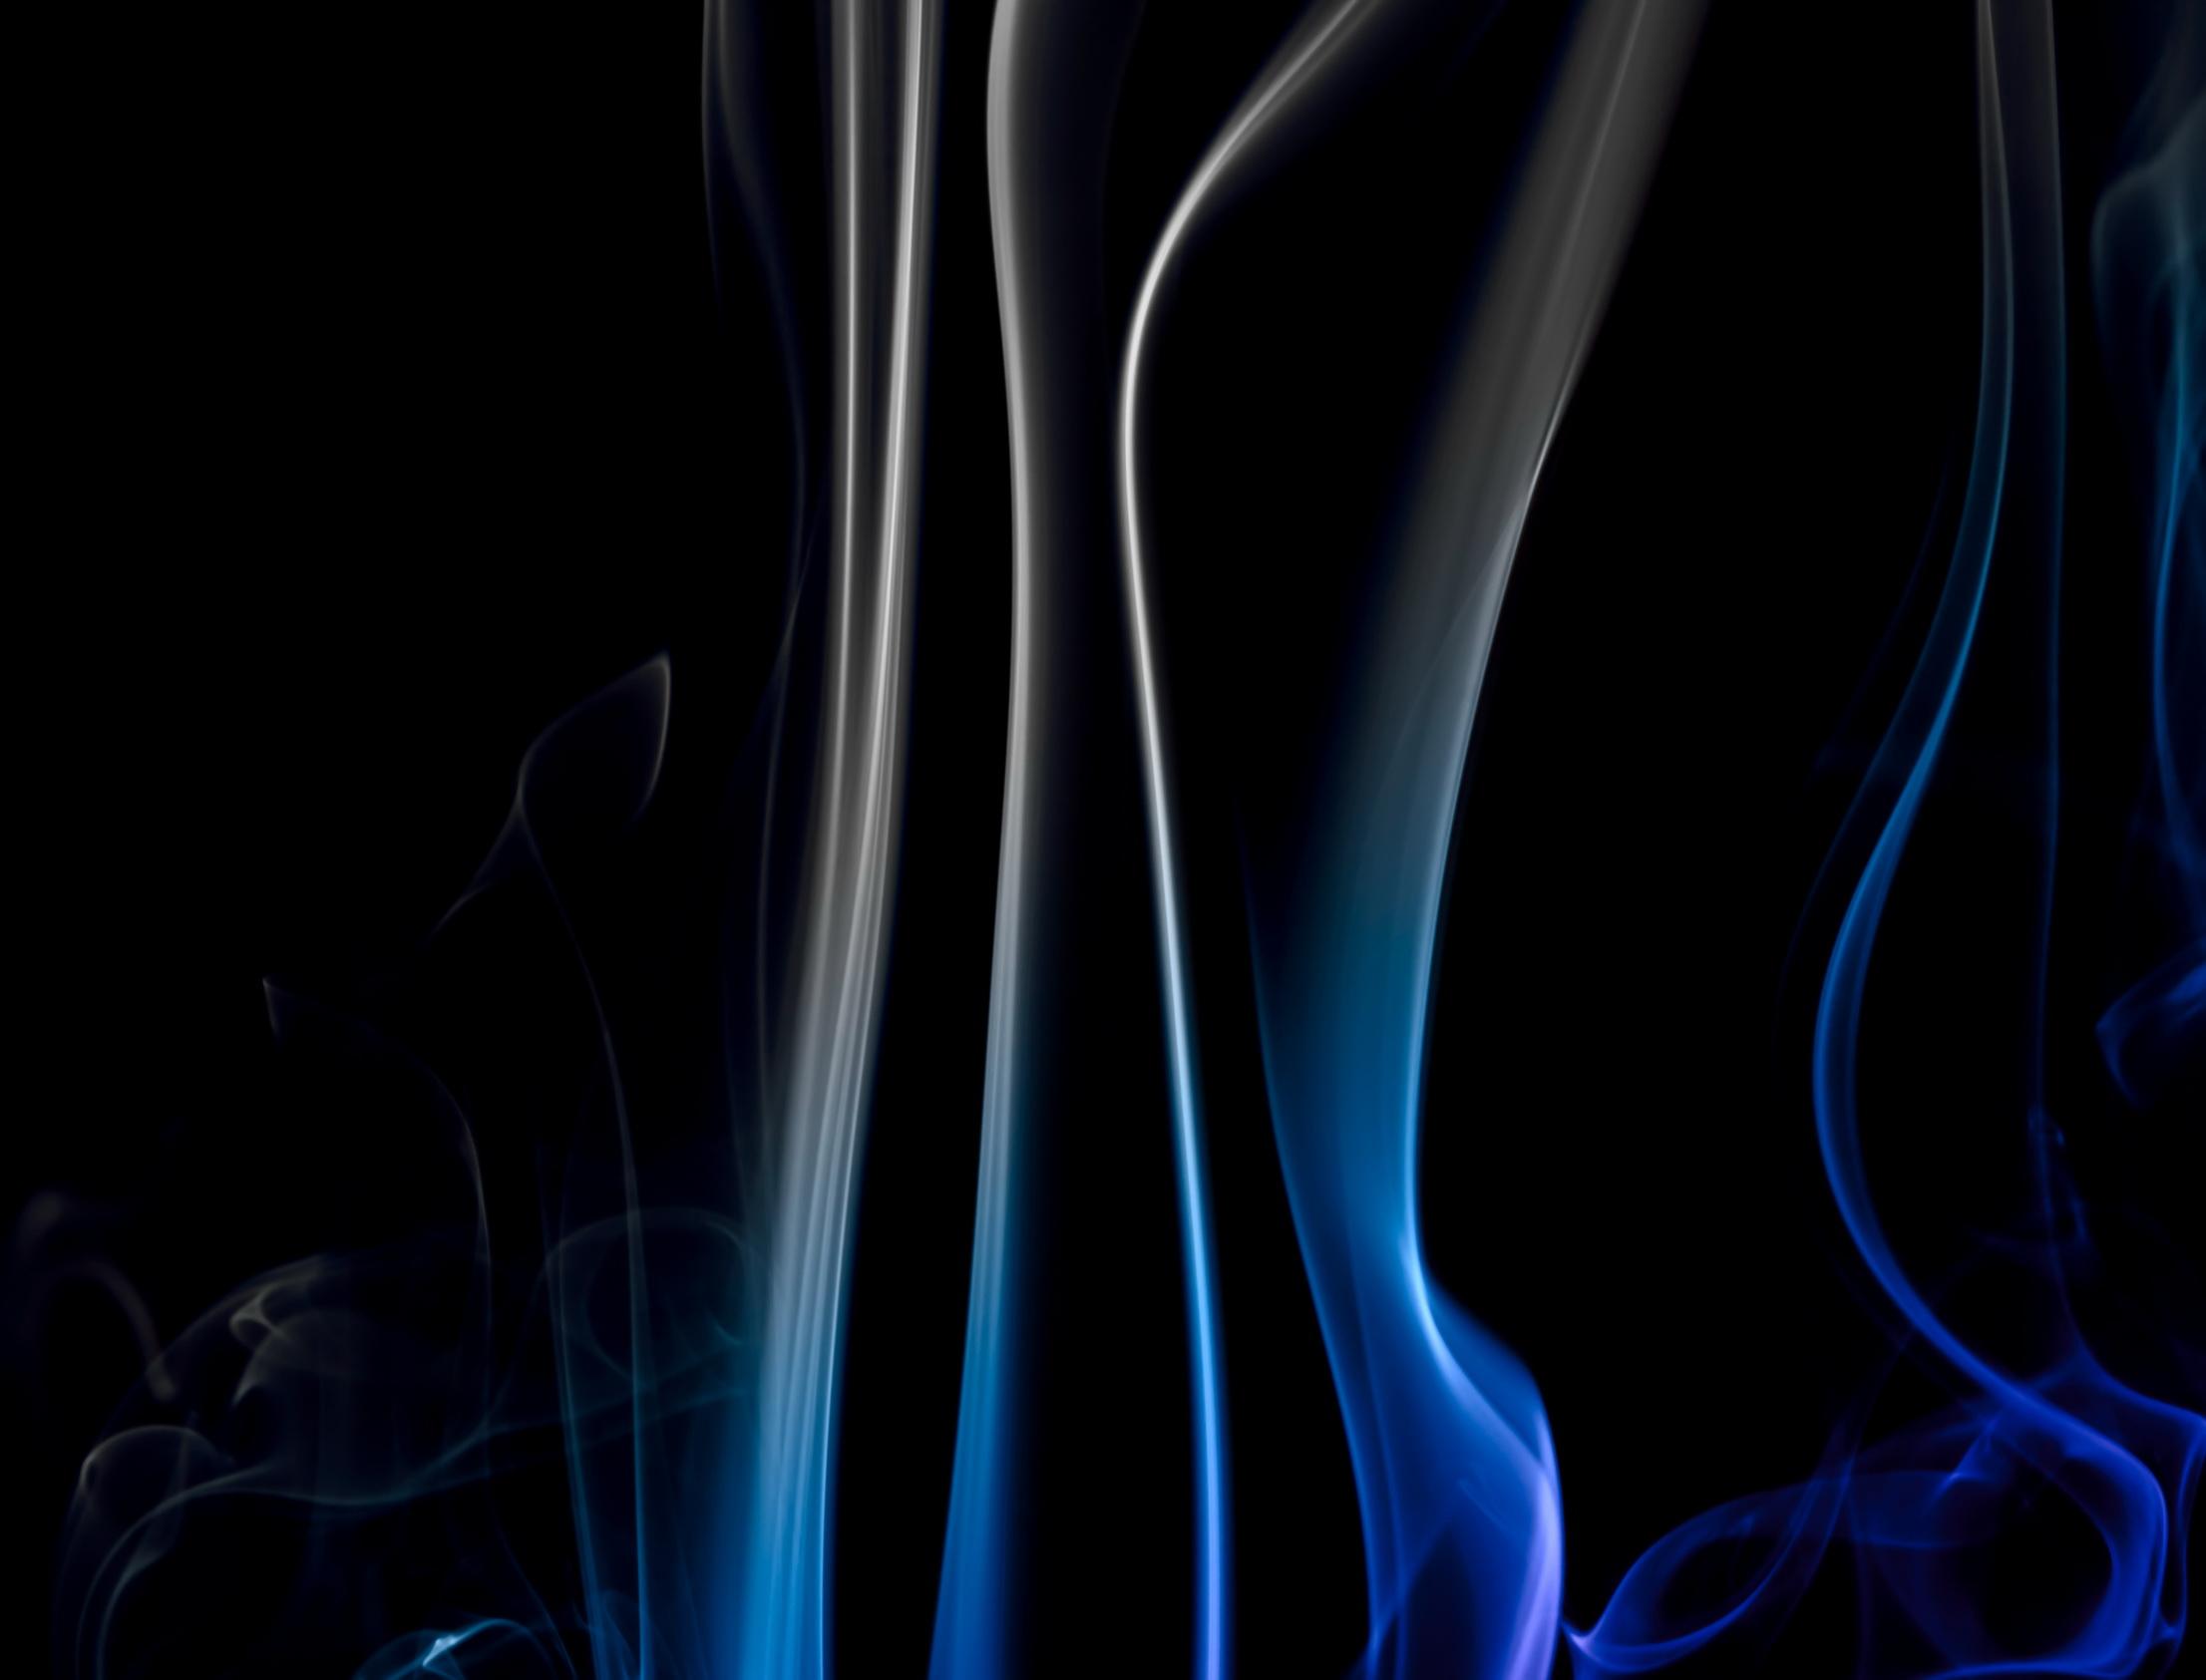 Blue smoke on black photo